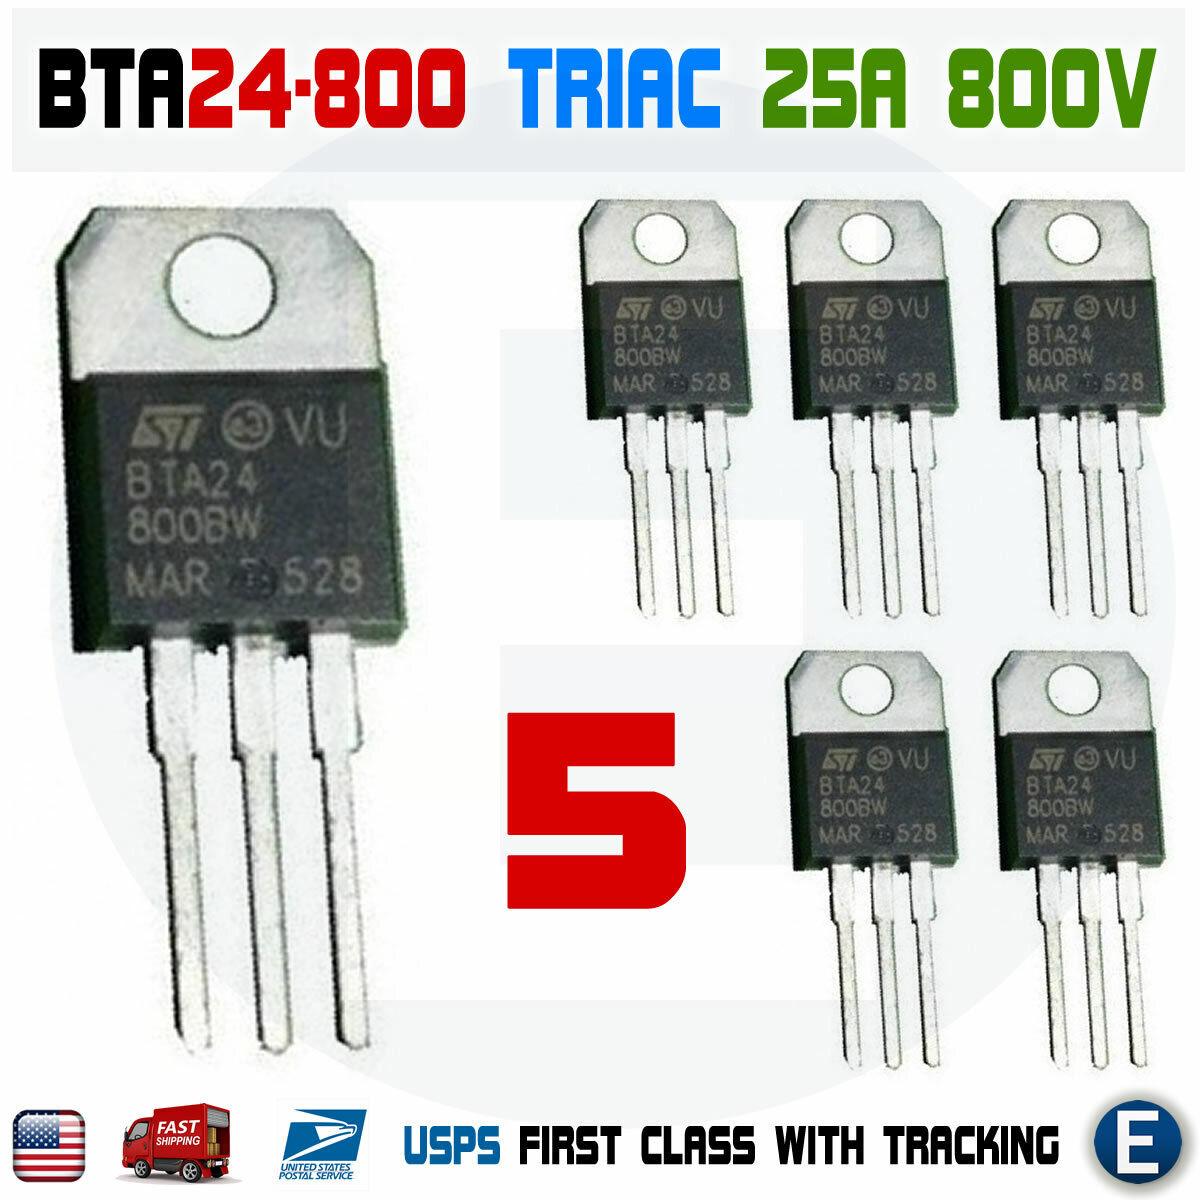 2  pcs BTA140-800  Triac  25A  800V  35mA   TO220  NEW  #BP